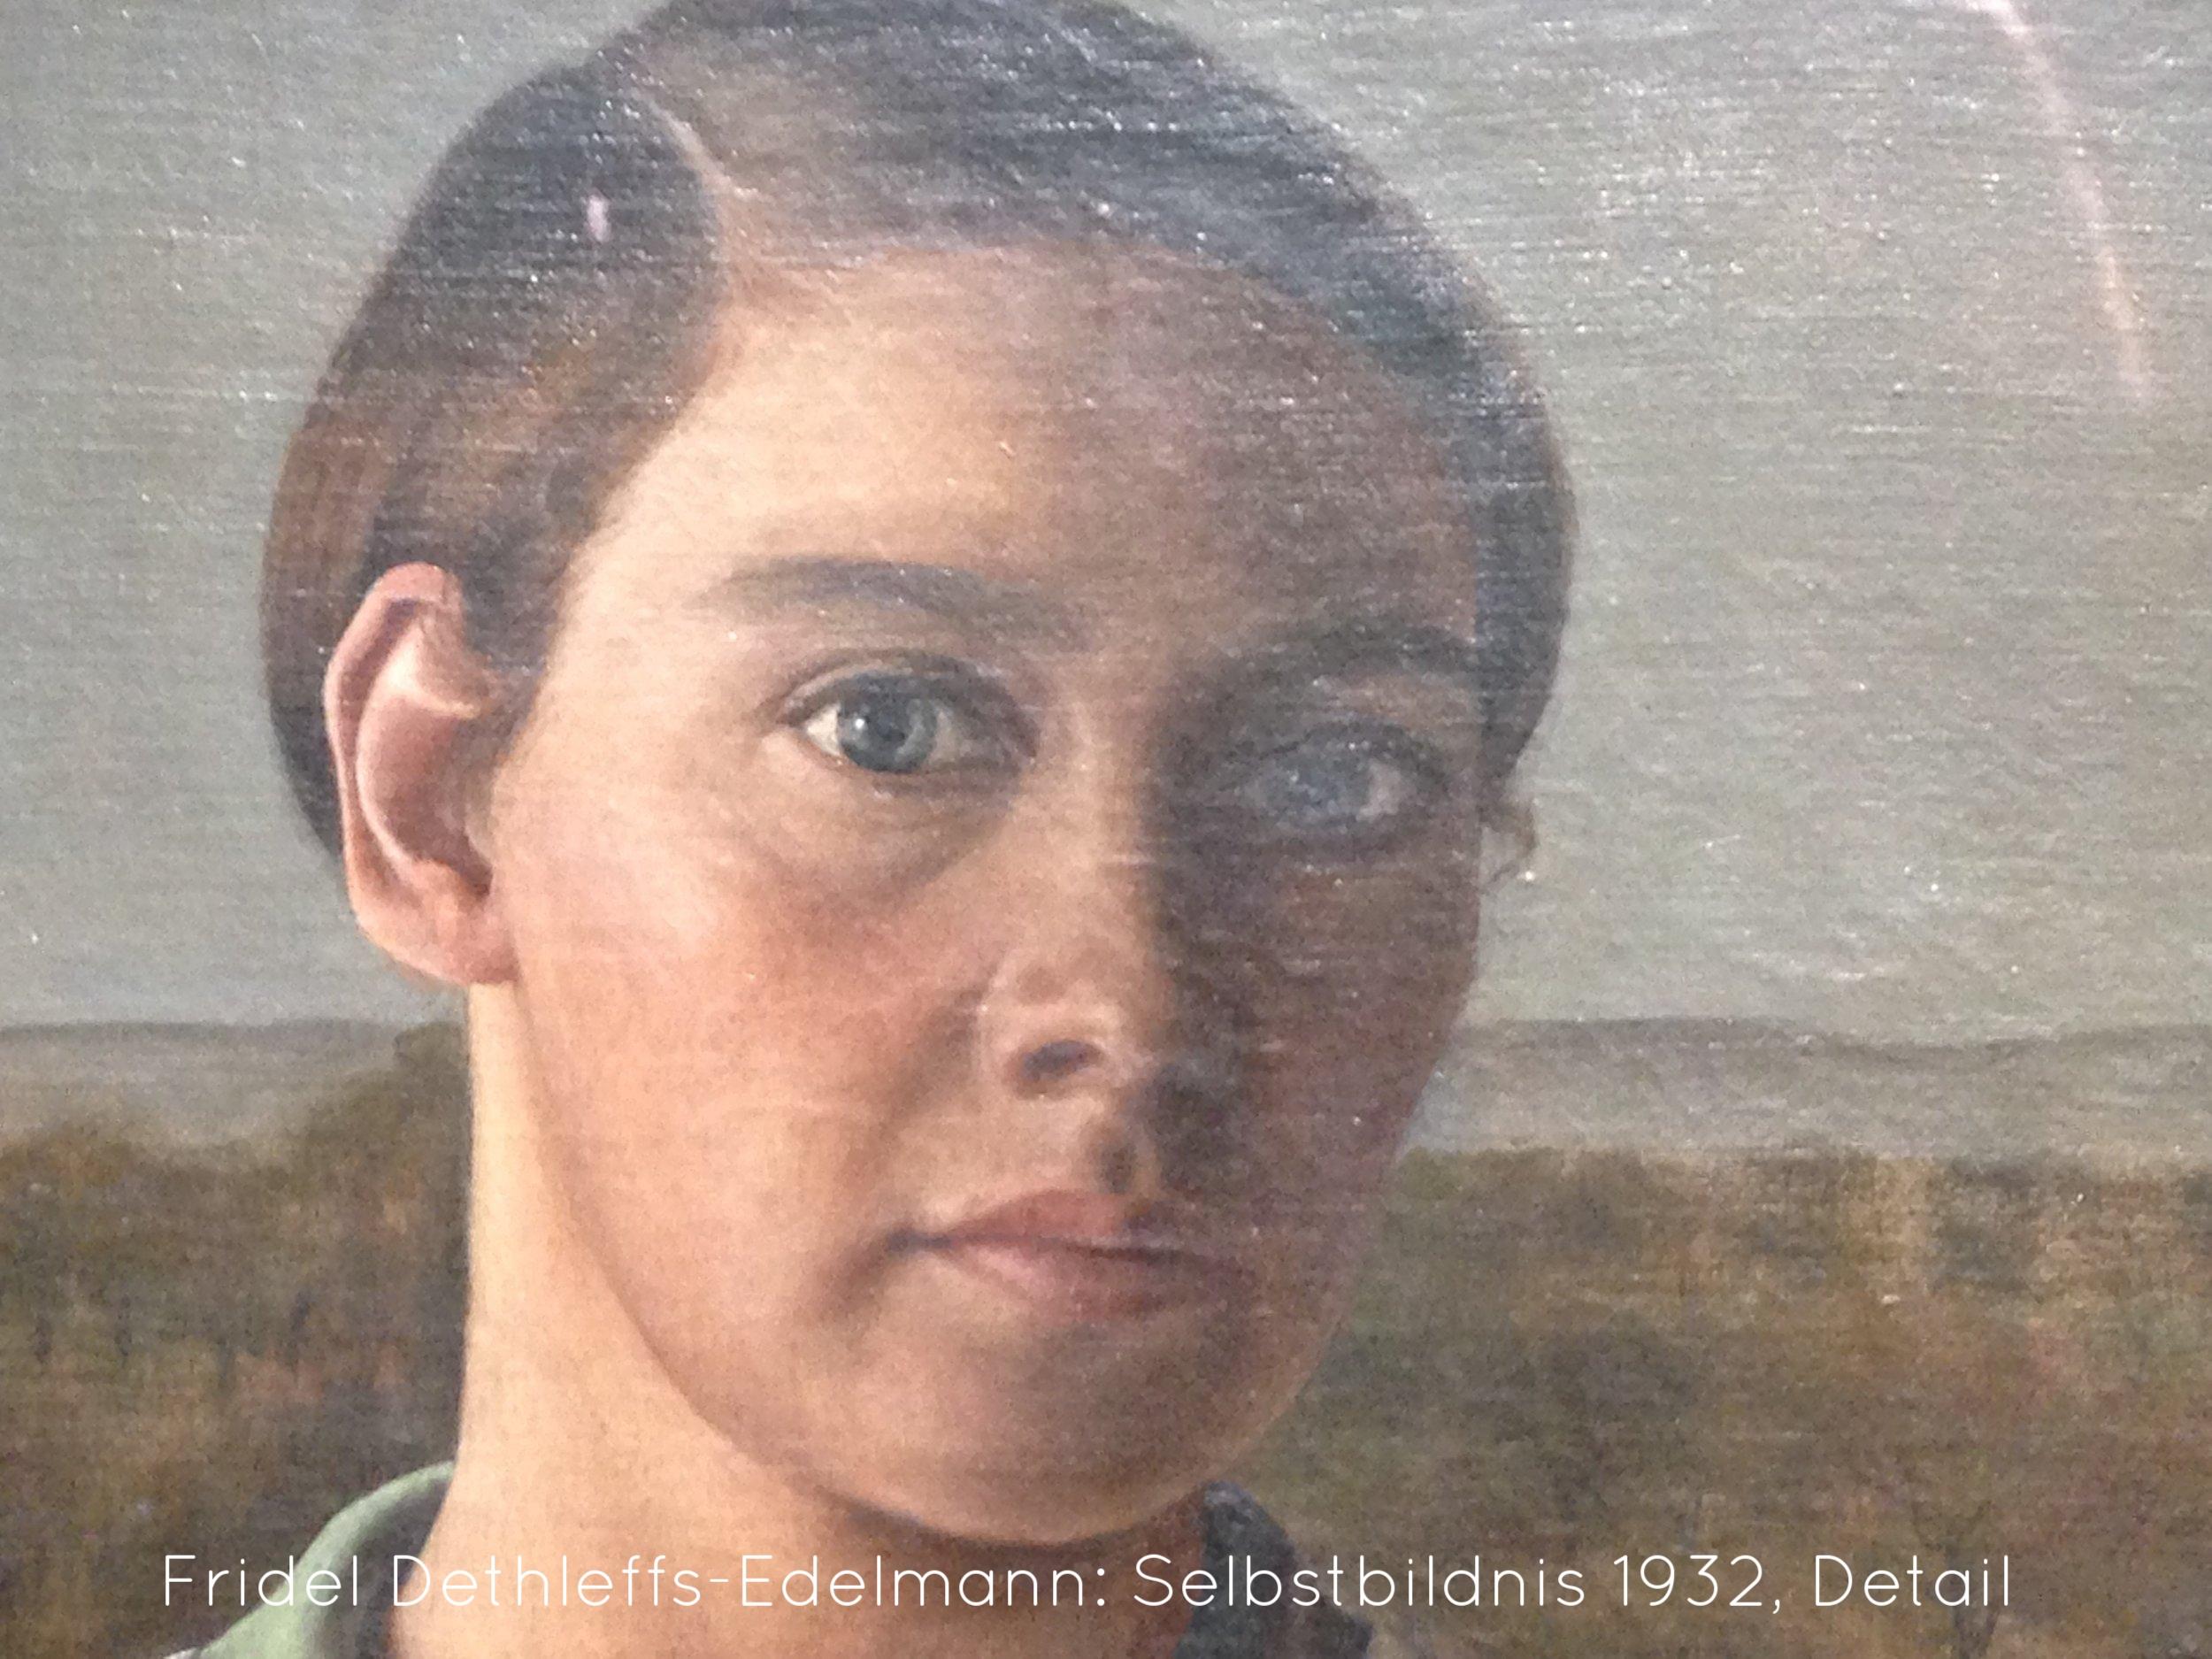 Fridel Dethleffs-Edelmann Selbstbildnis II.jpg